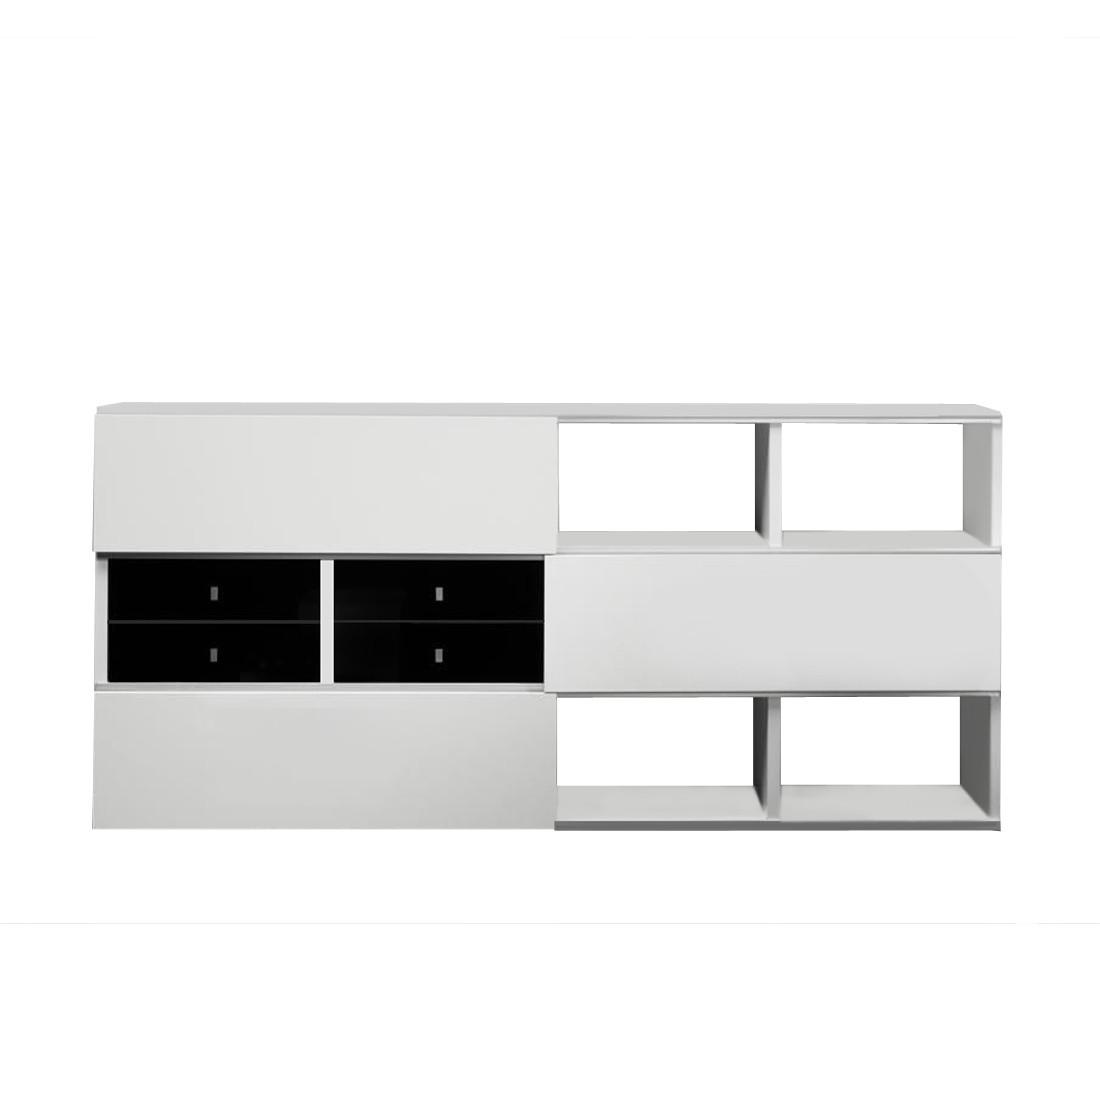 sideboard hochglanz preis vergleich 2016. Black Bedroom Furniture Sets. Home Design Ideas